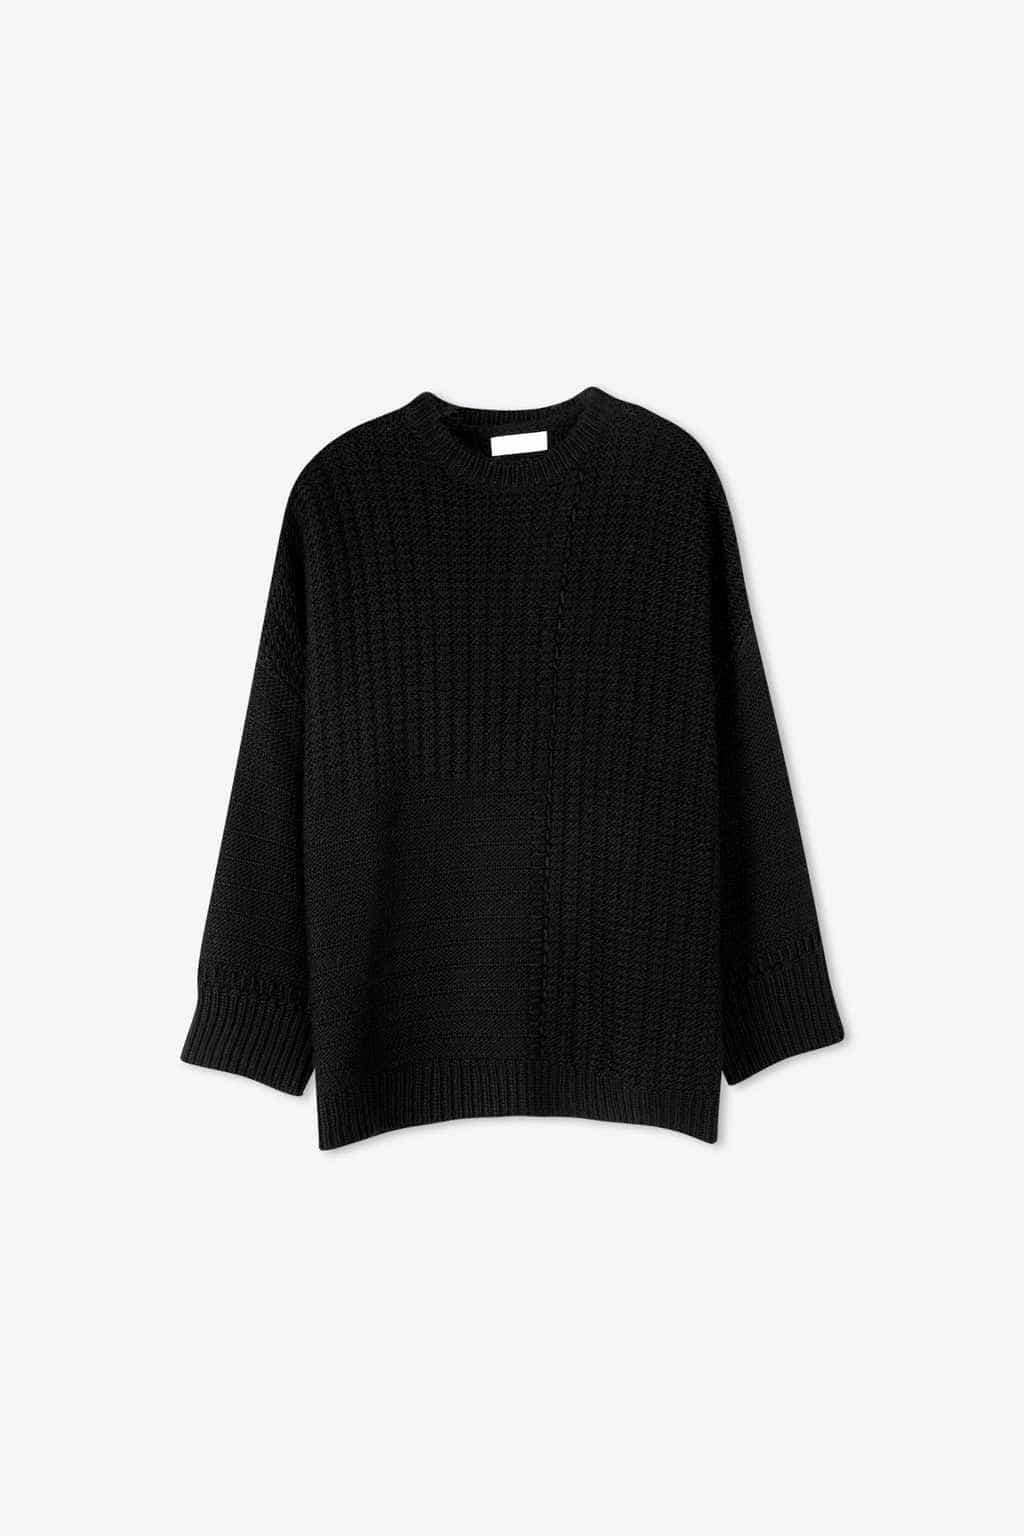 Sweater 2523 Black 7